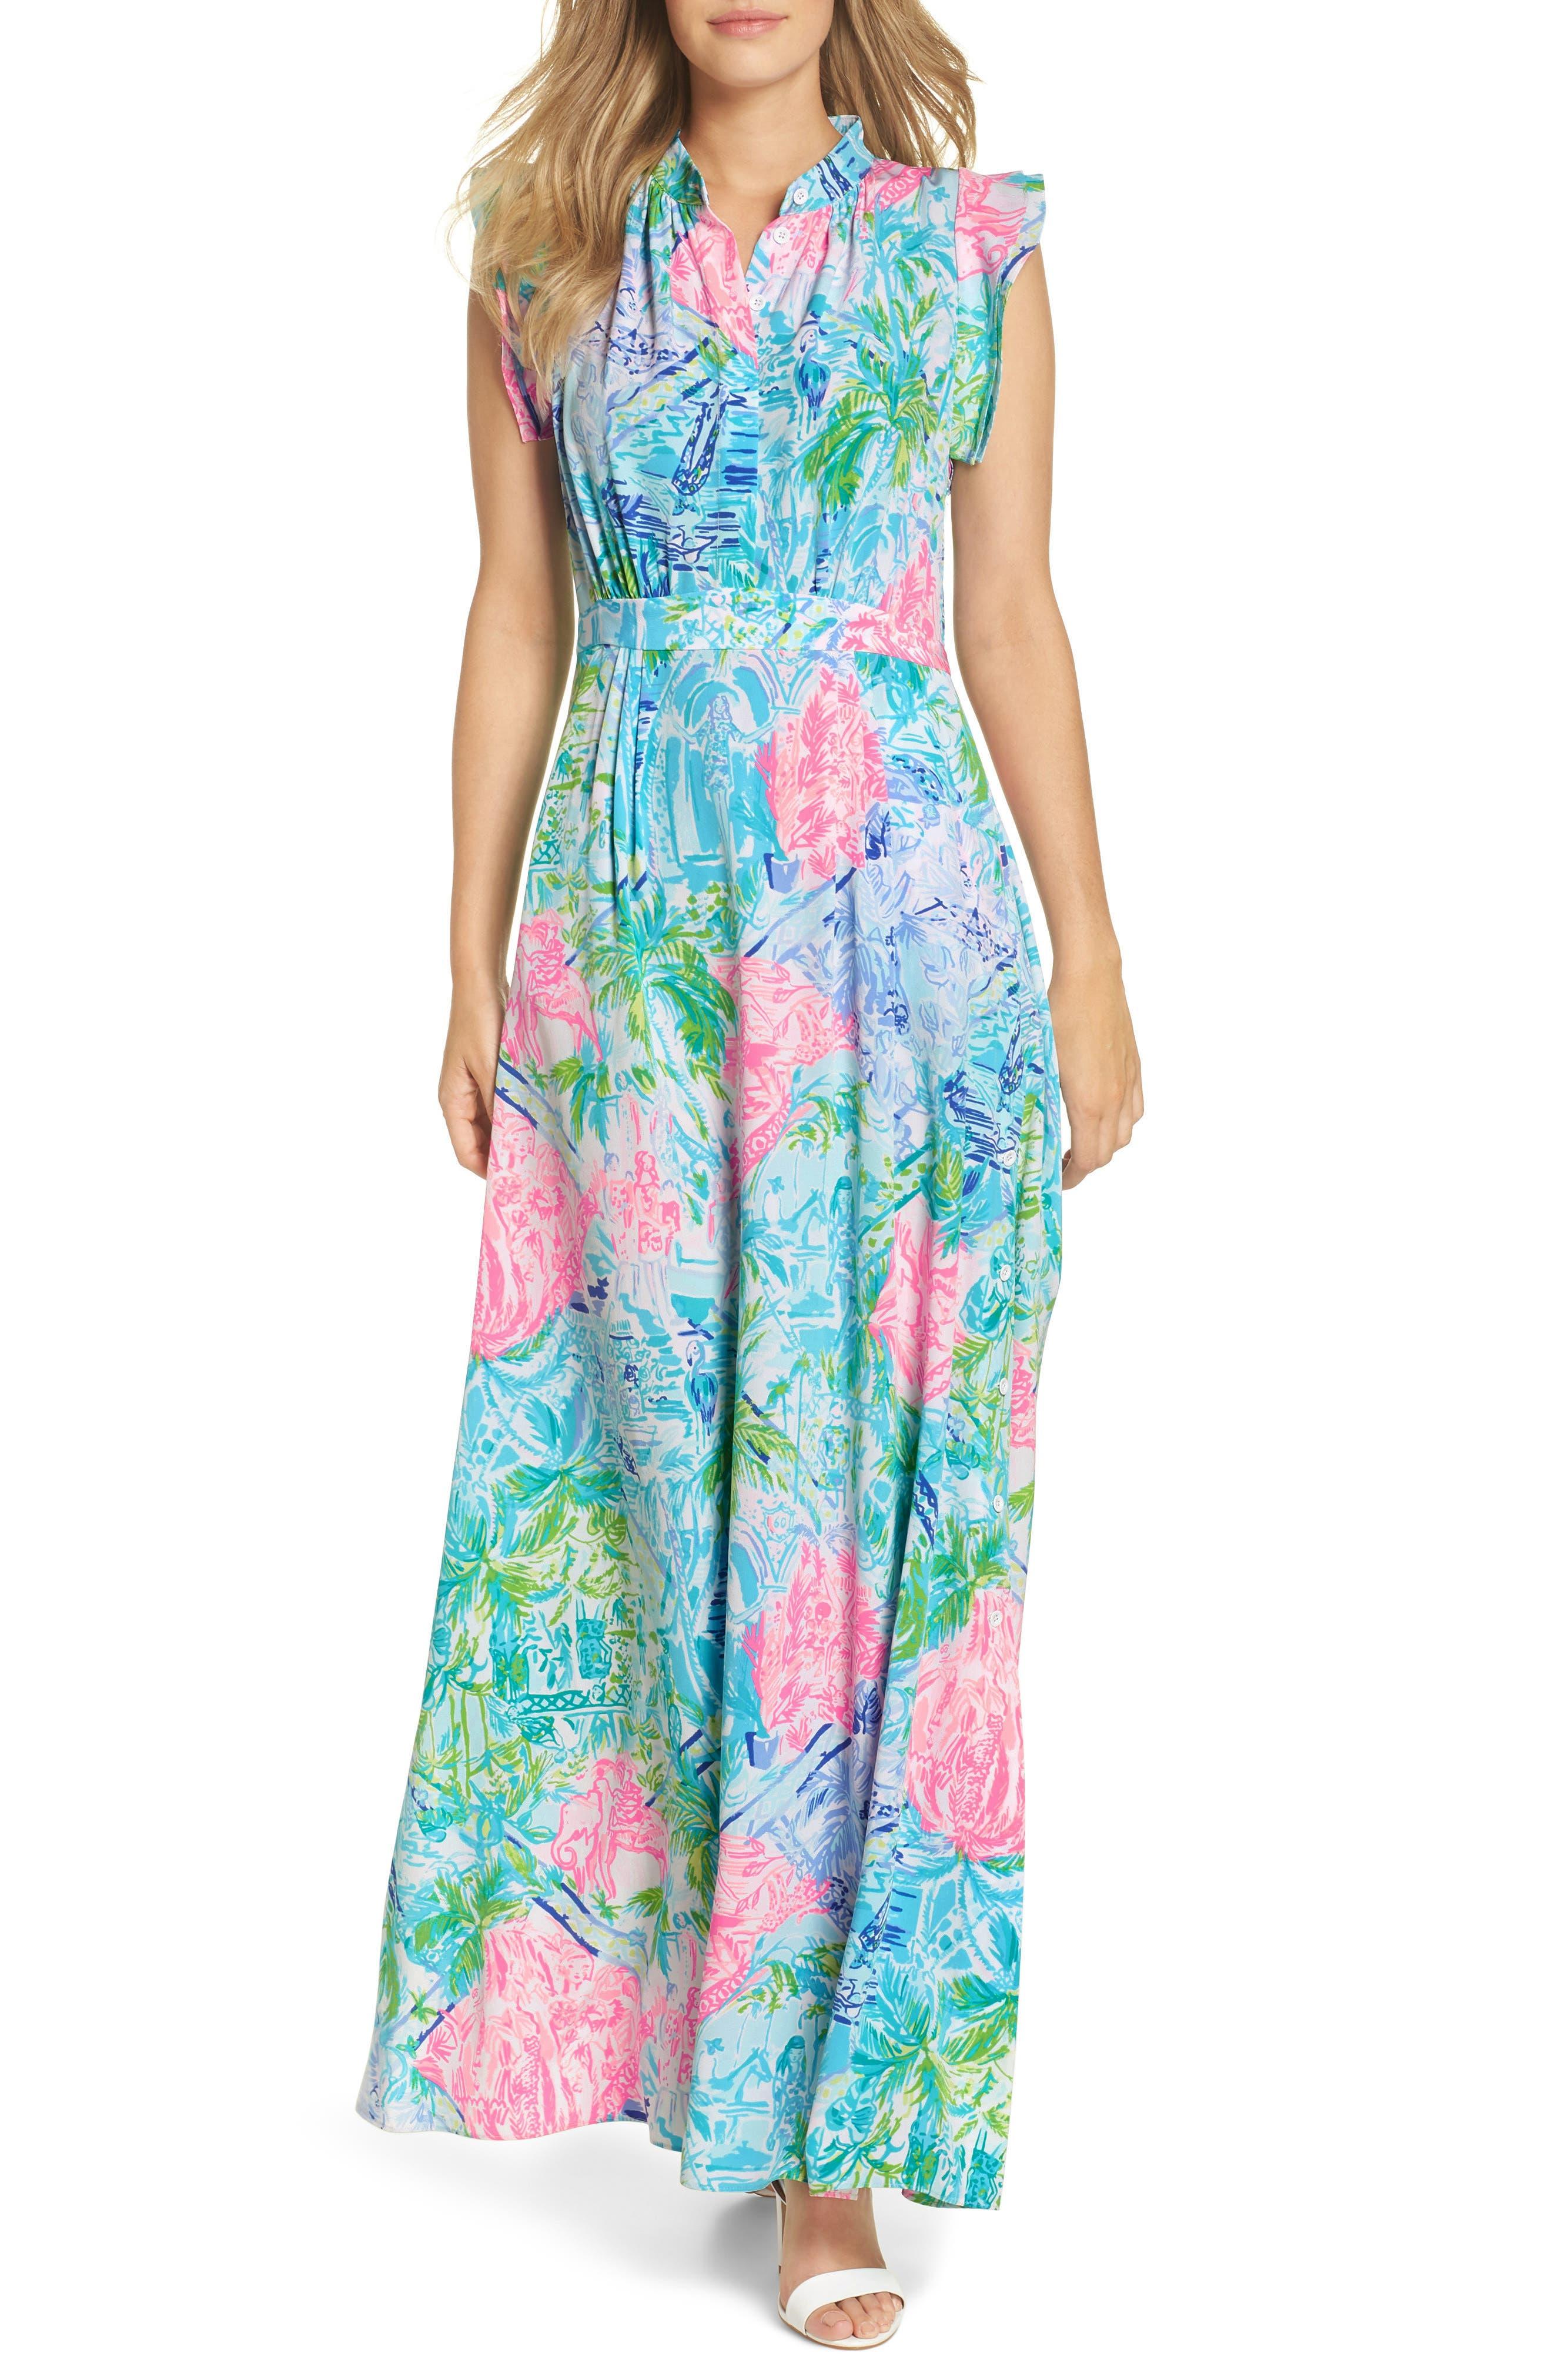 Lilly Pulitzer Palm Beach Silk Maxi Dress, Blue/green